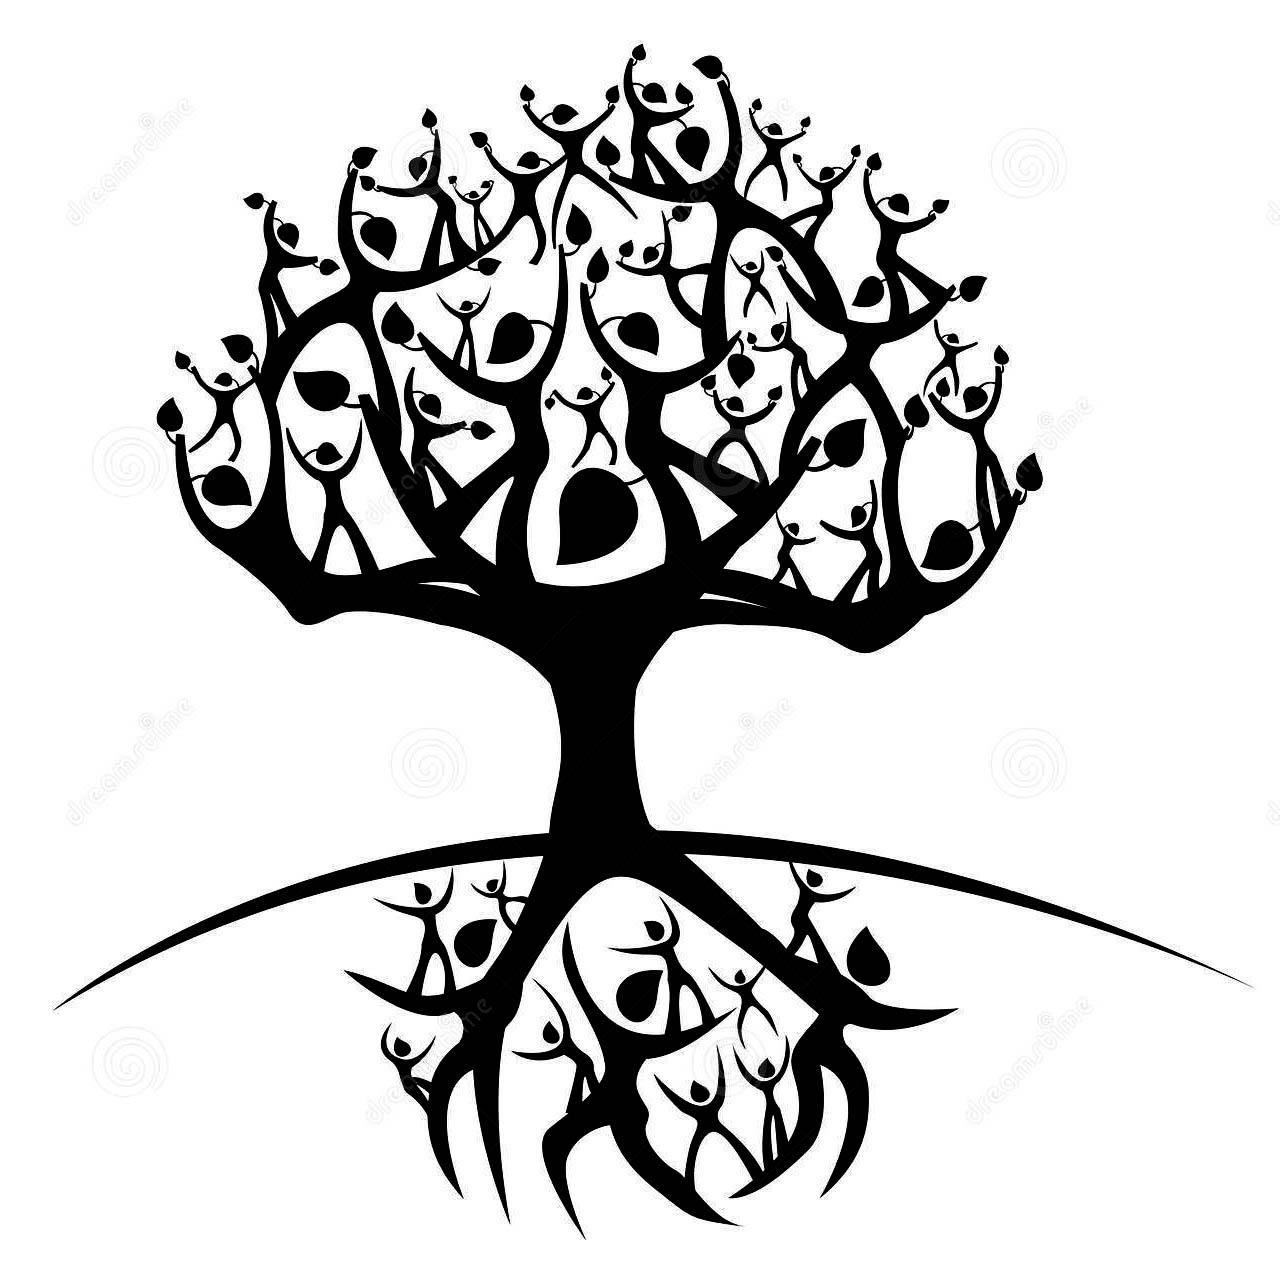 1280x1266 Tribal Tree Drawings Tribal Lion Drawings